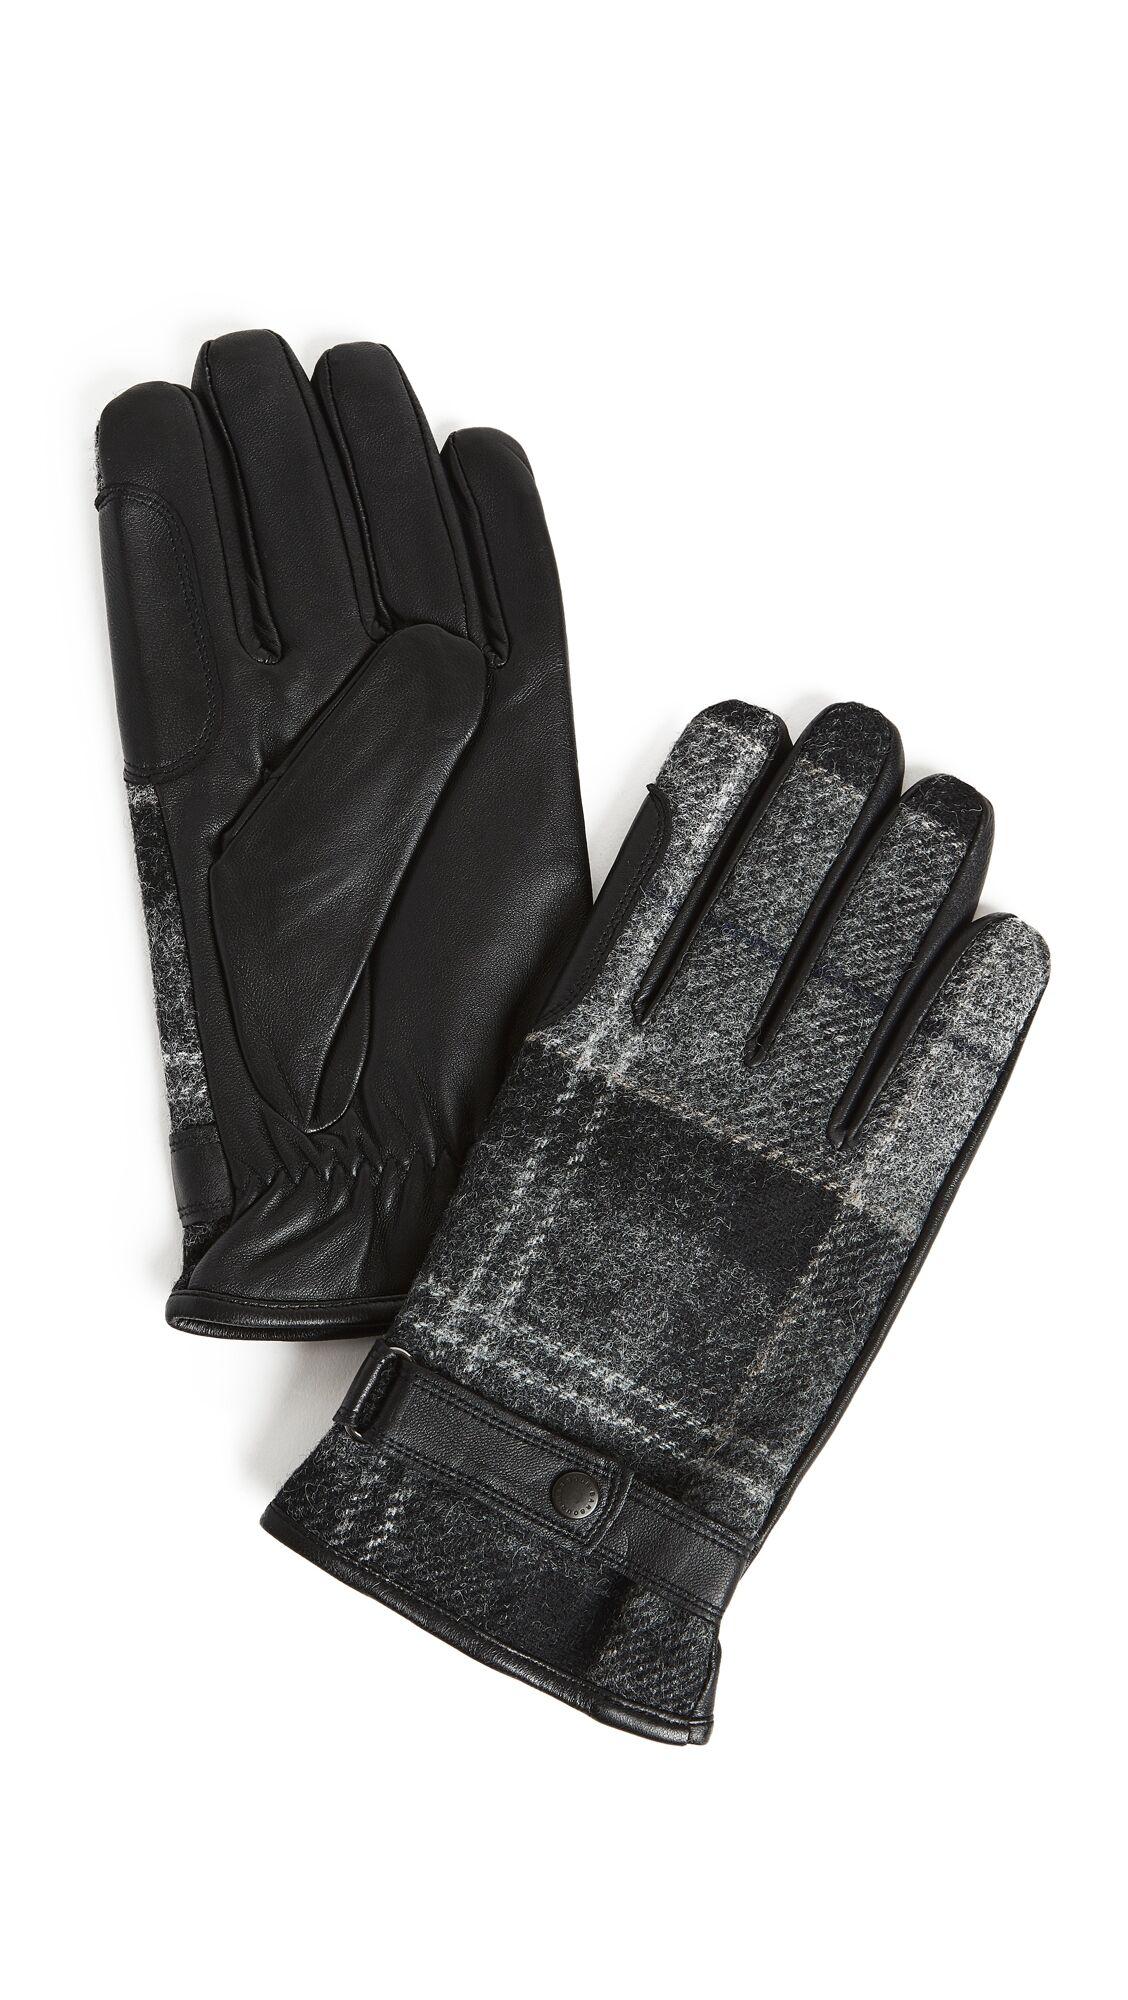 Barbour Newbrough Tartan Gloves - Black/Grey - Size: M